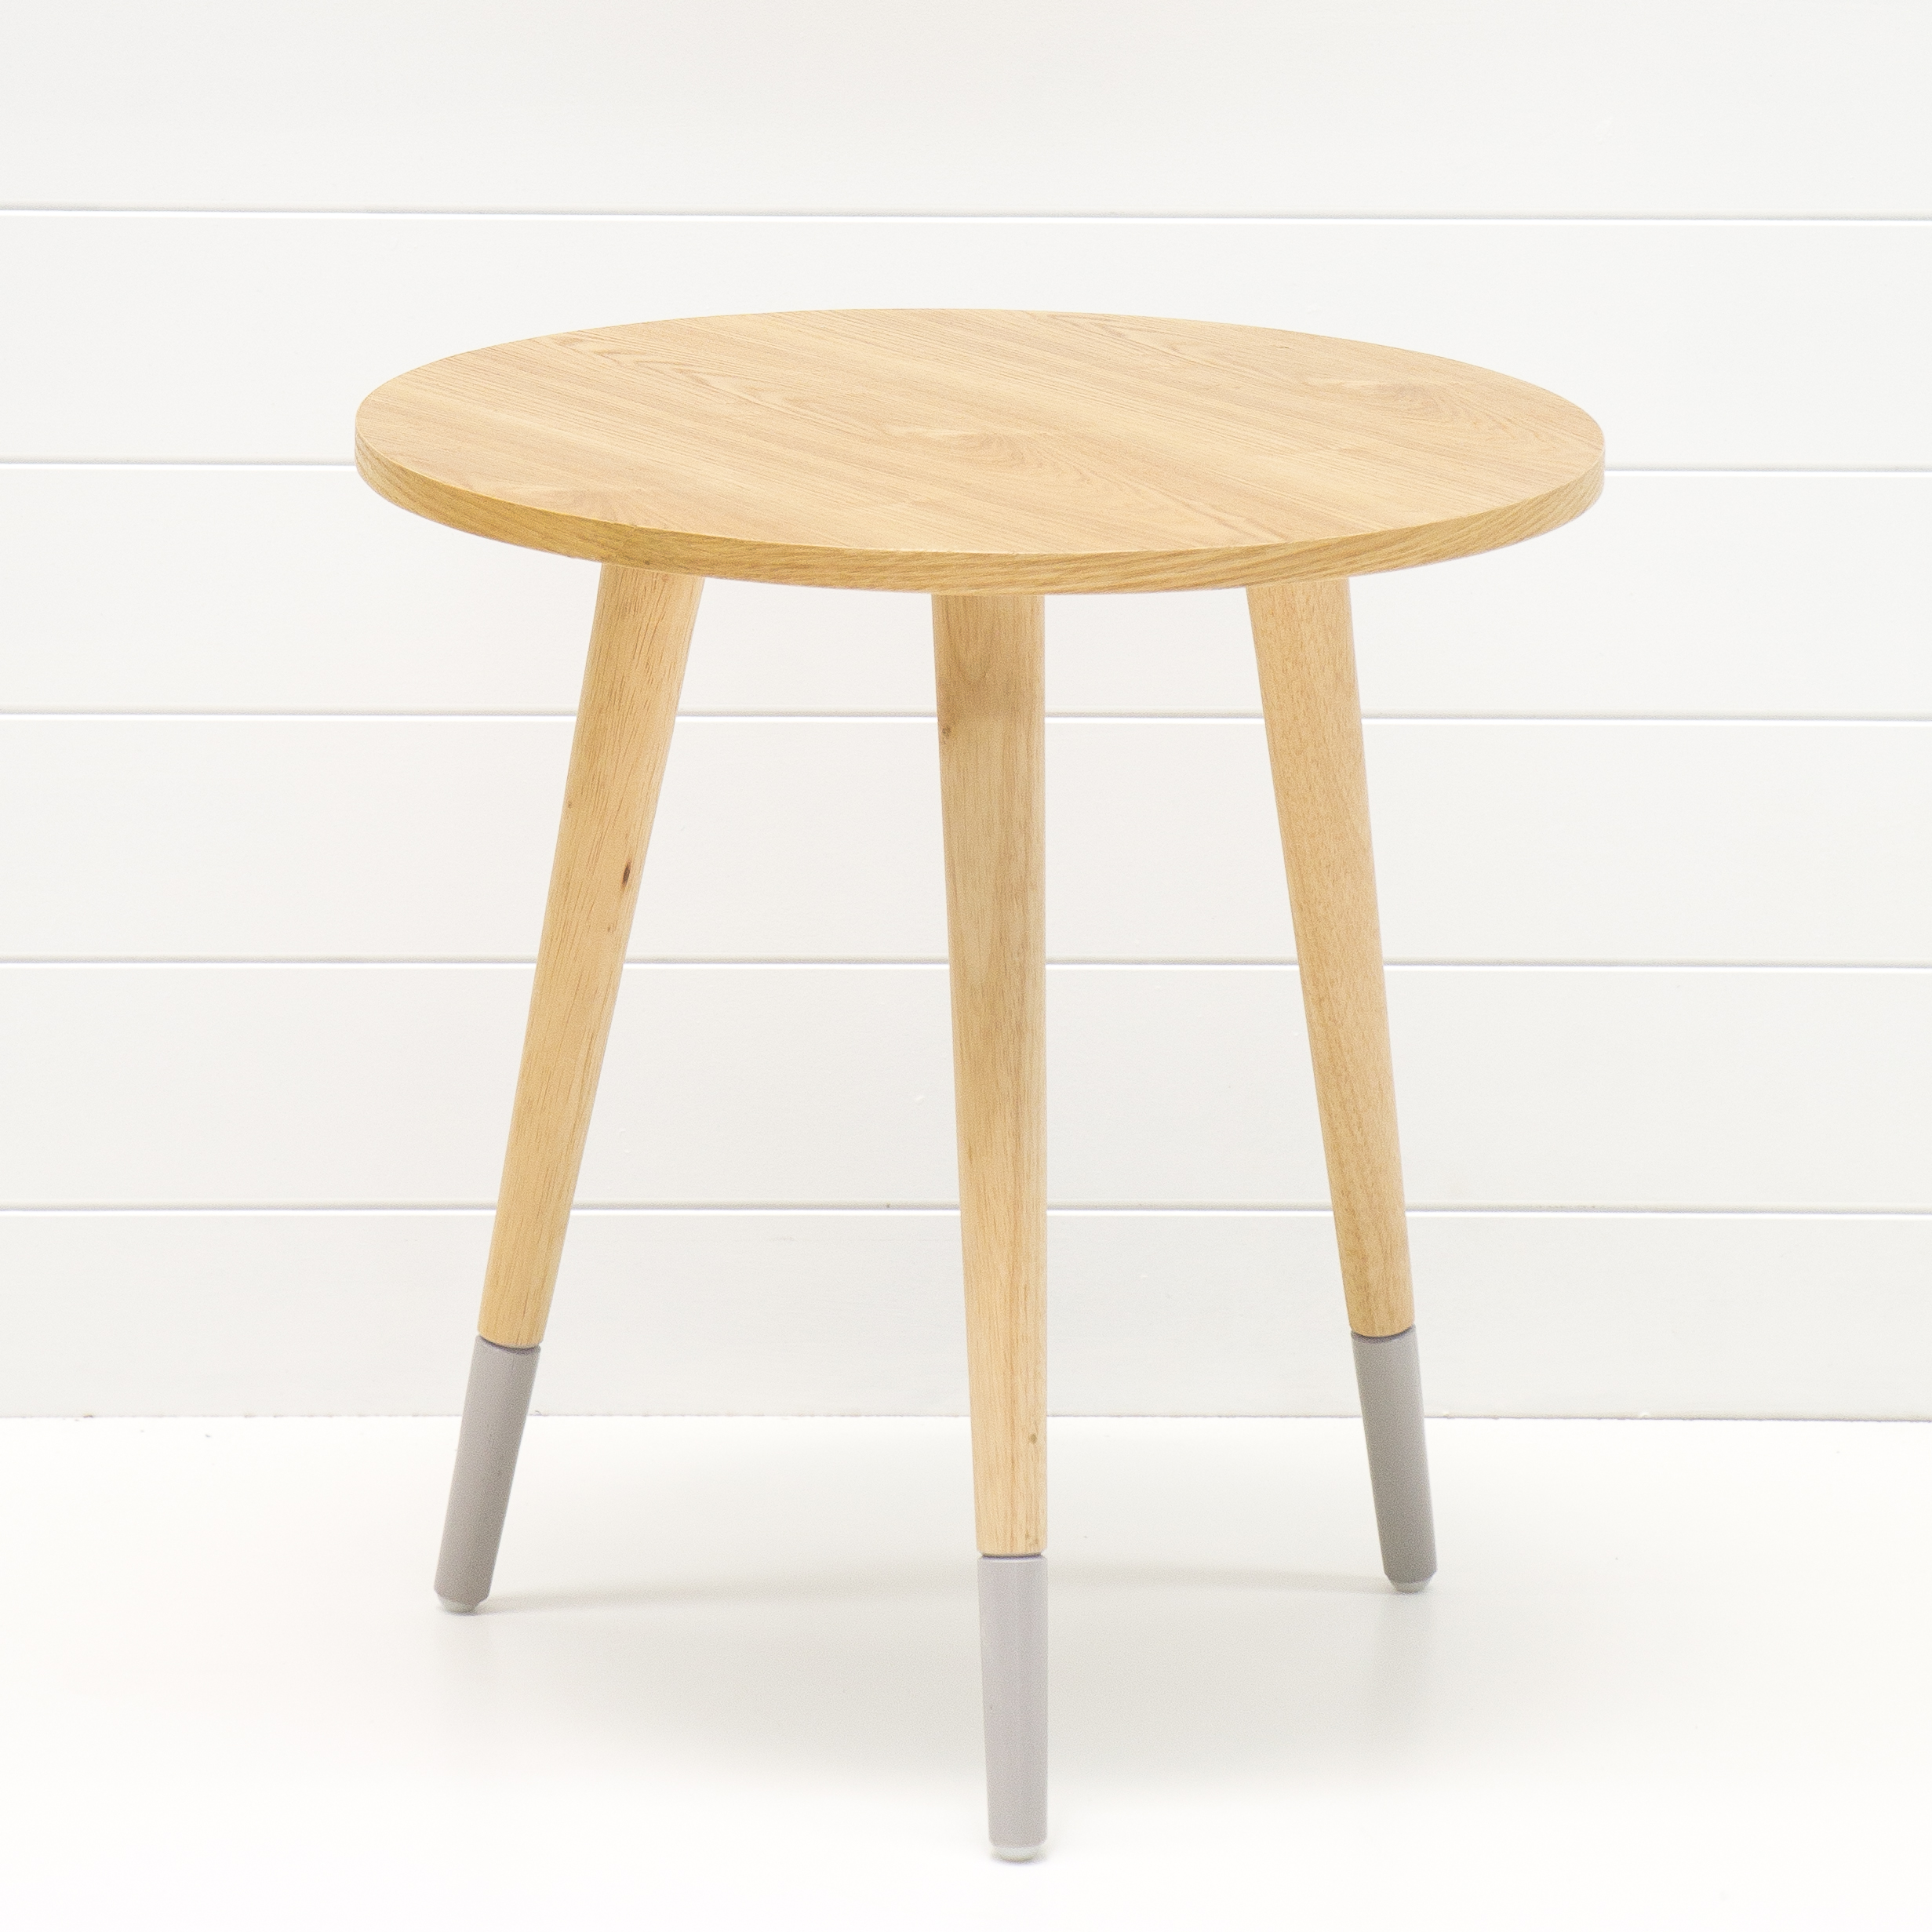 Teak Side Table with Grey Legs